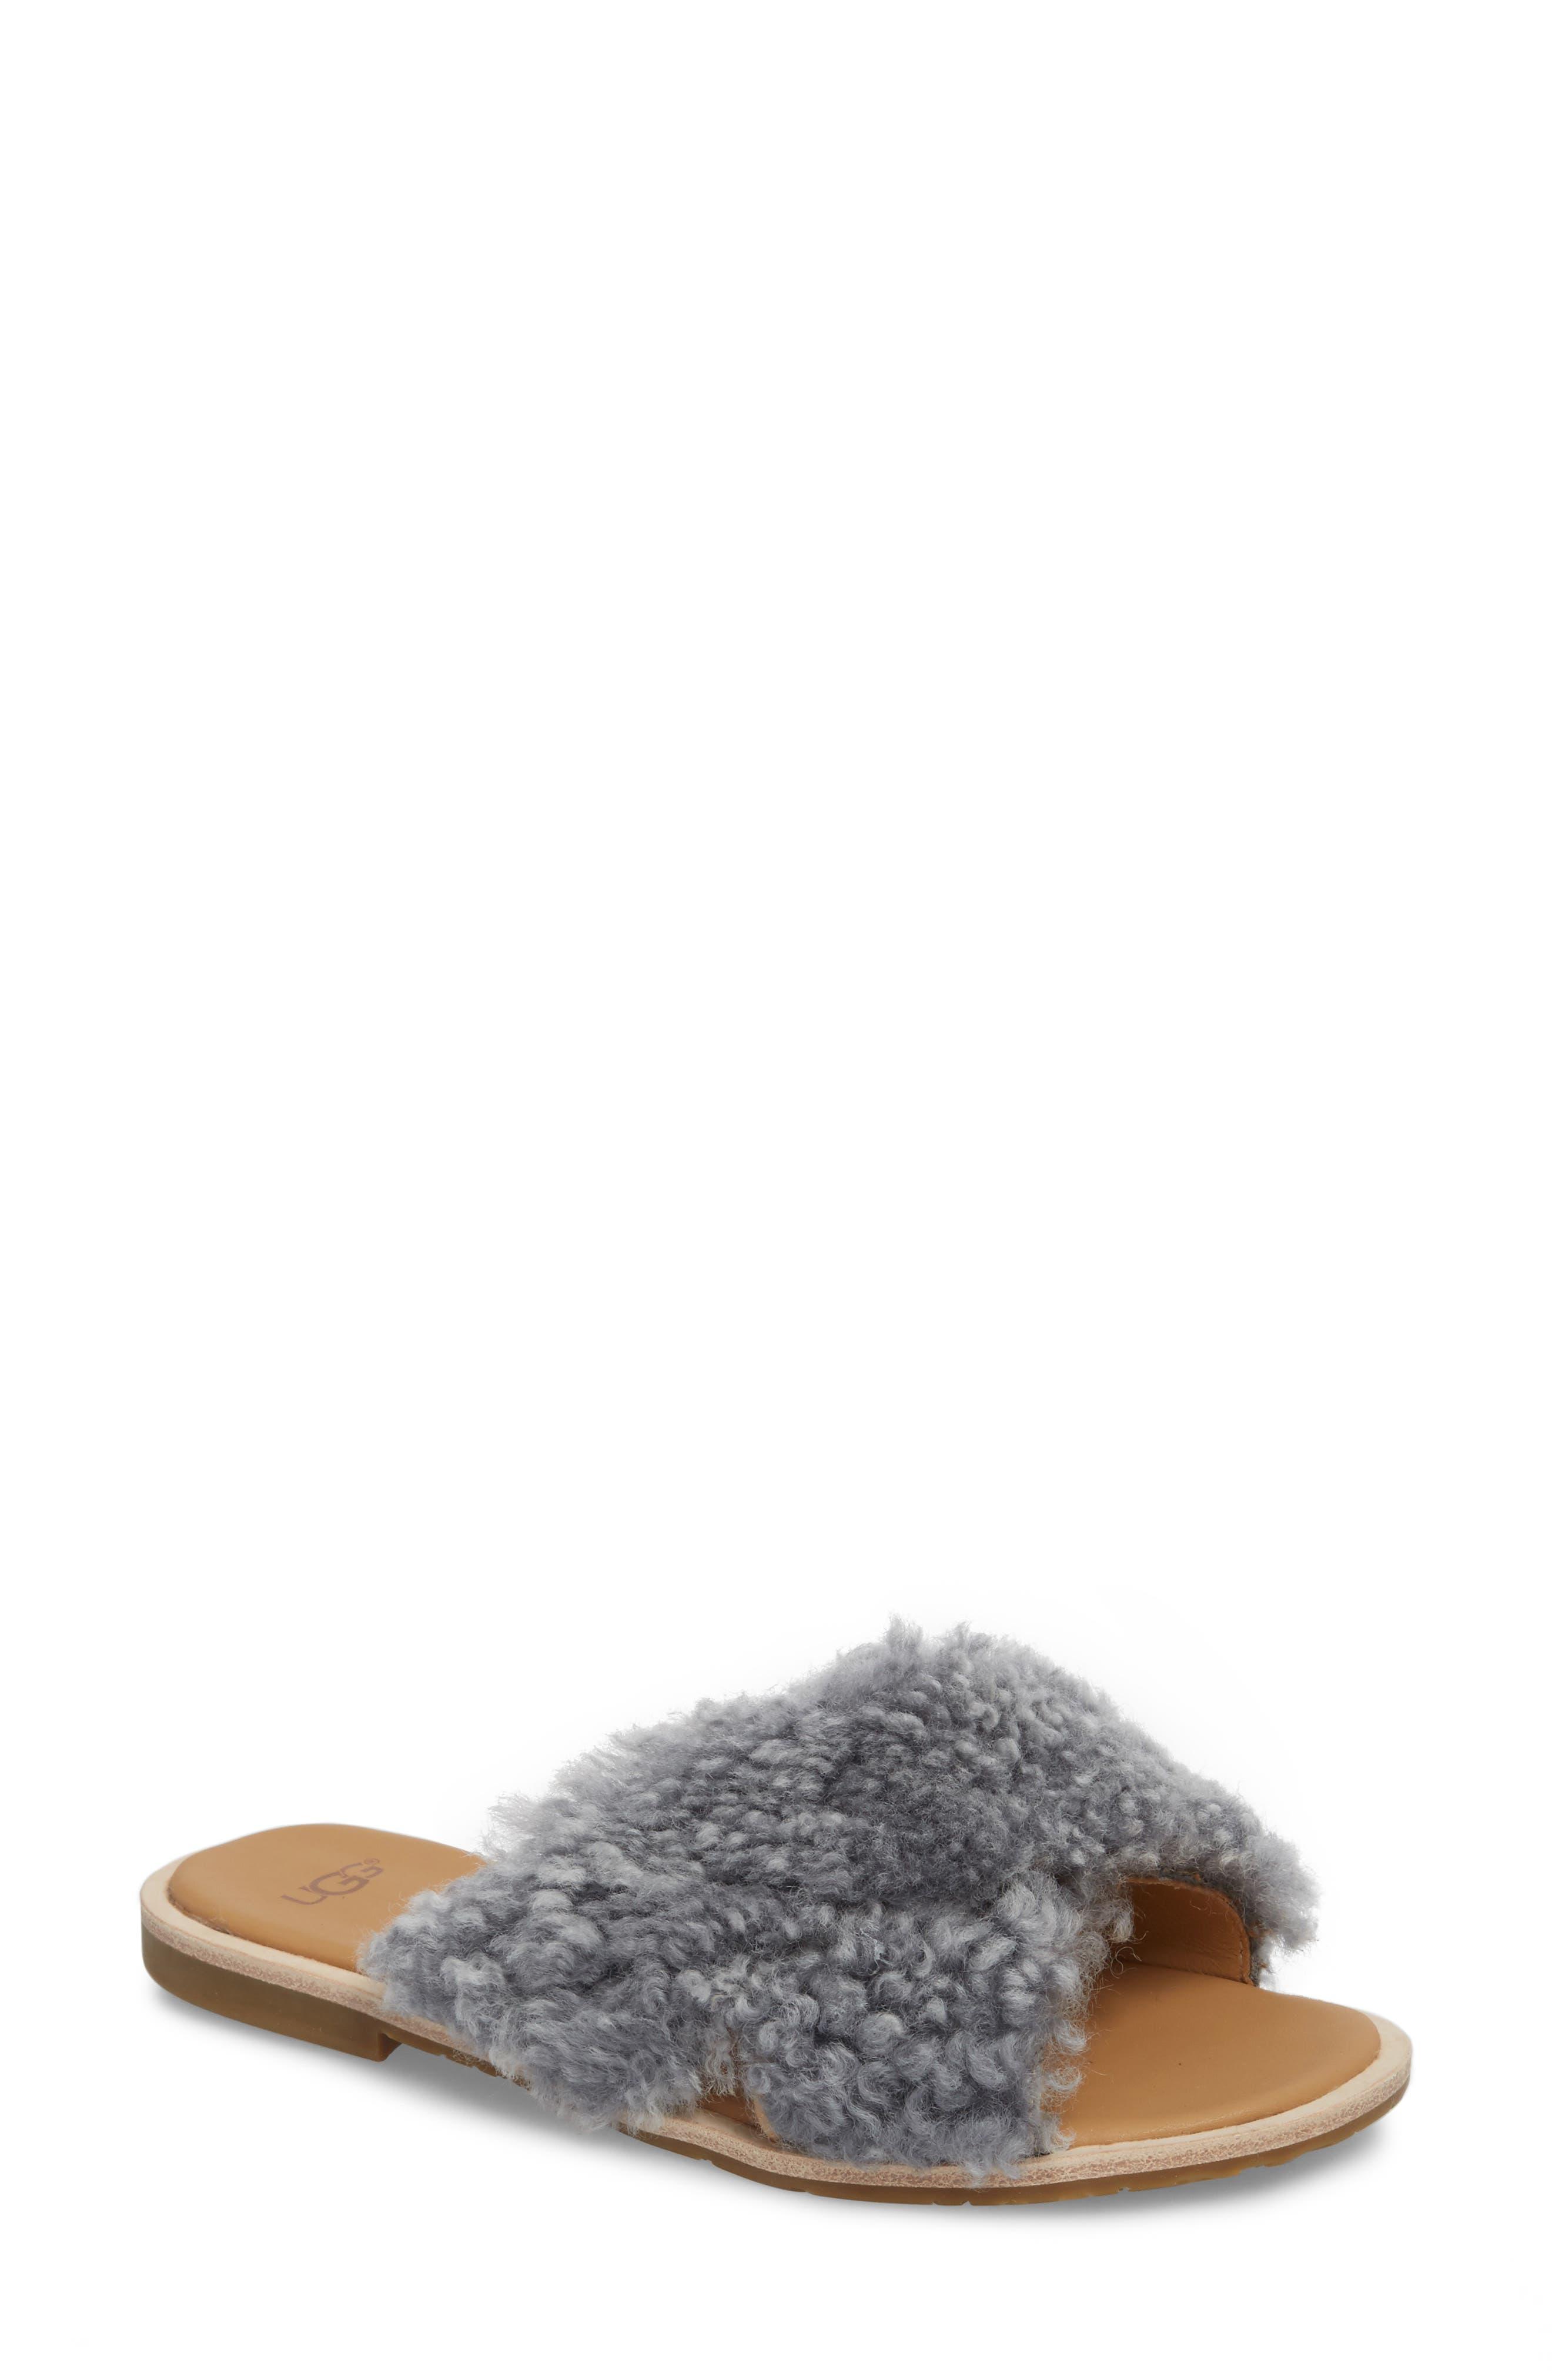 Ugg Joni Genuine Shearling Slide Sandal, Grey